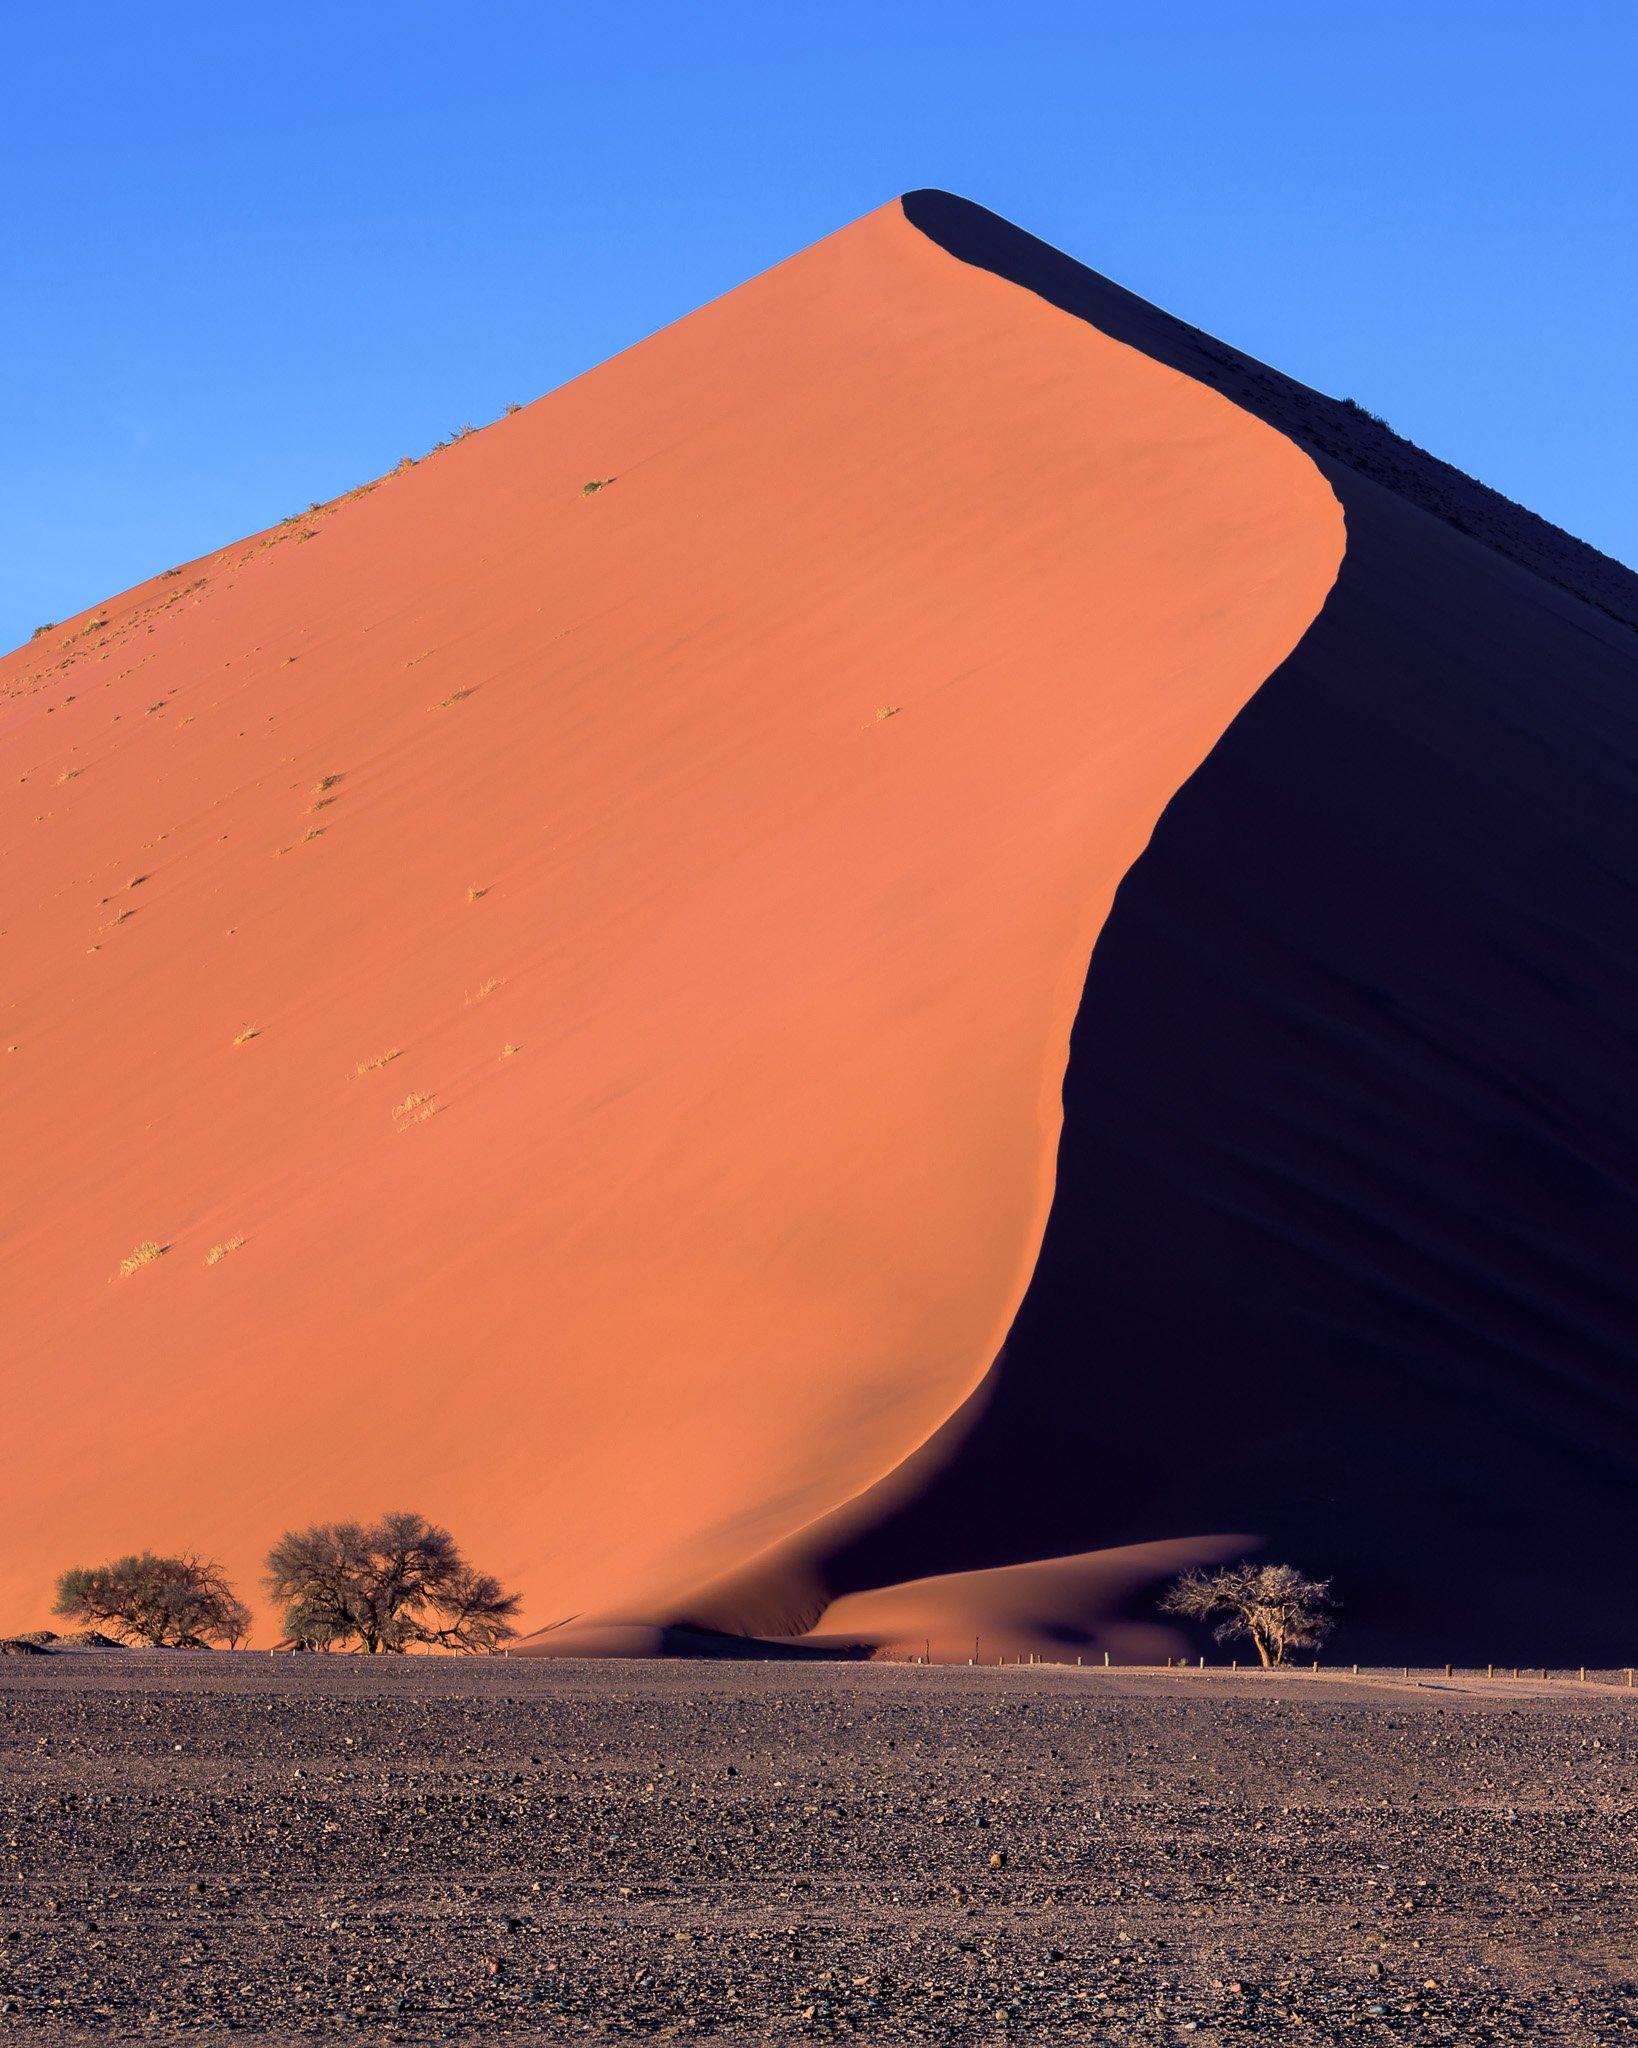 acacia, adventure, Africa, african, arid, background, big, blue, climb, daddy, desert, drought, dry, dune, heat, high, hiking, hill, hot, landscape, morning, mountain, namib, namibia, national, natural, nature, naukluft, orange, outdoor, pattern, peak, re, anshar